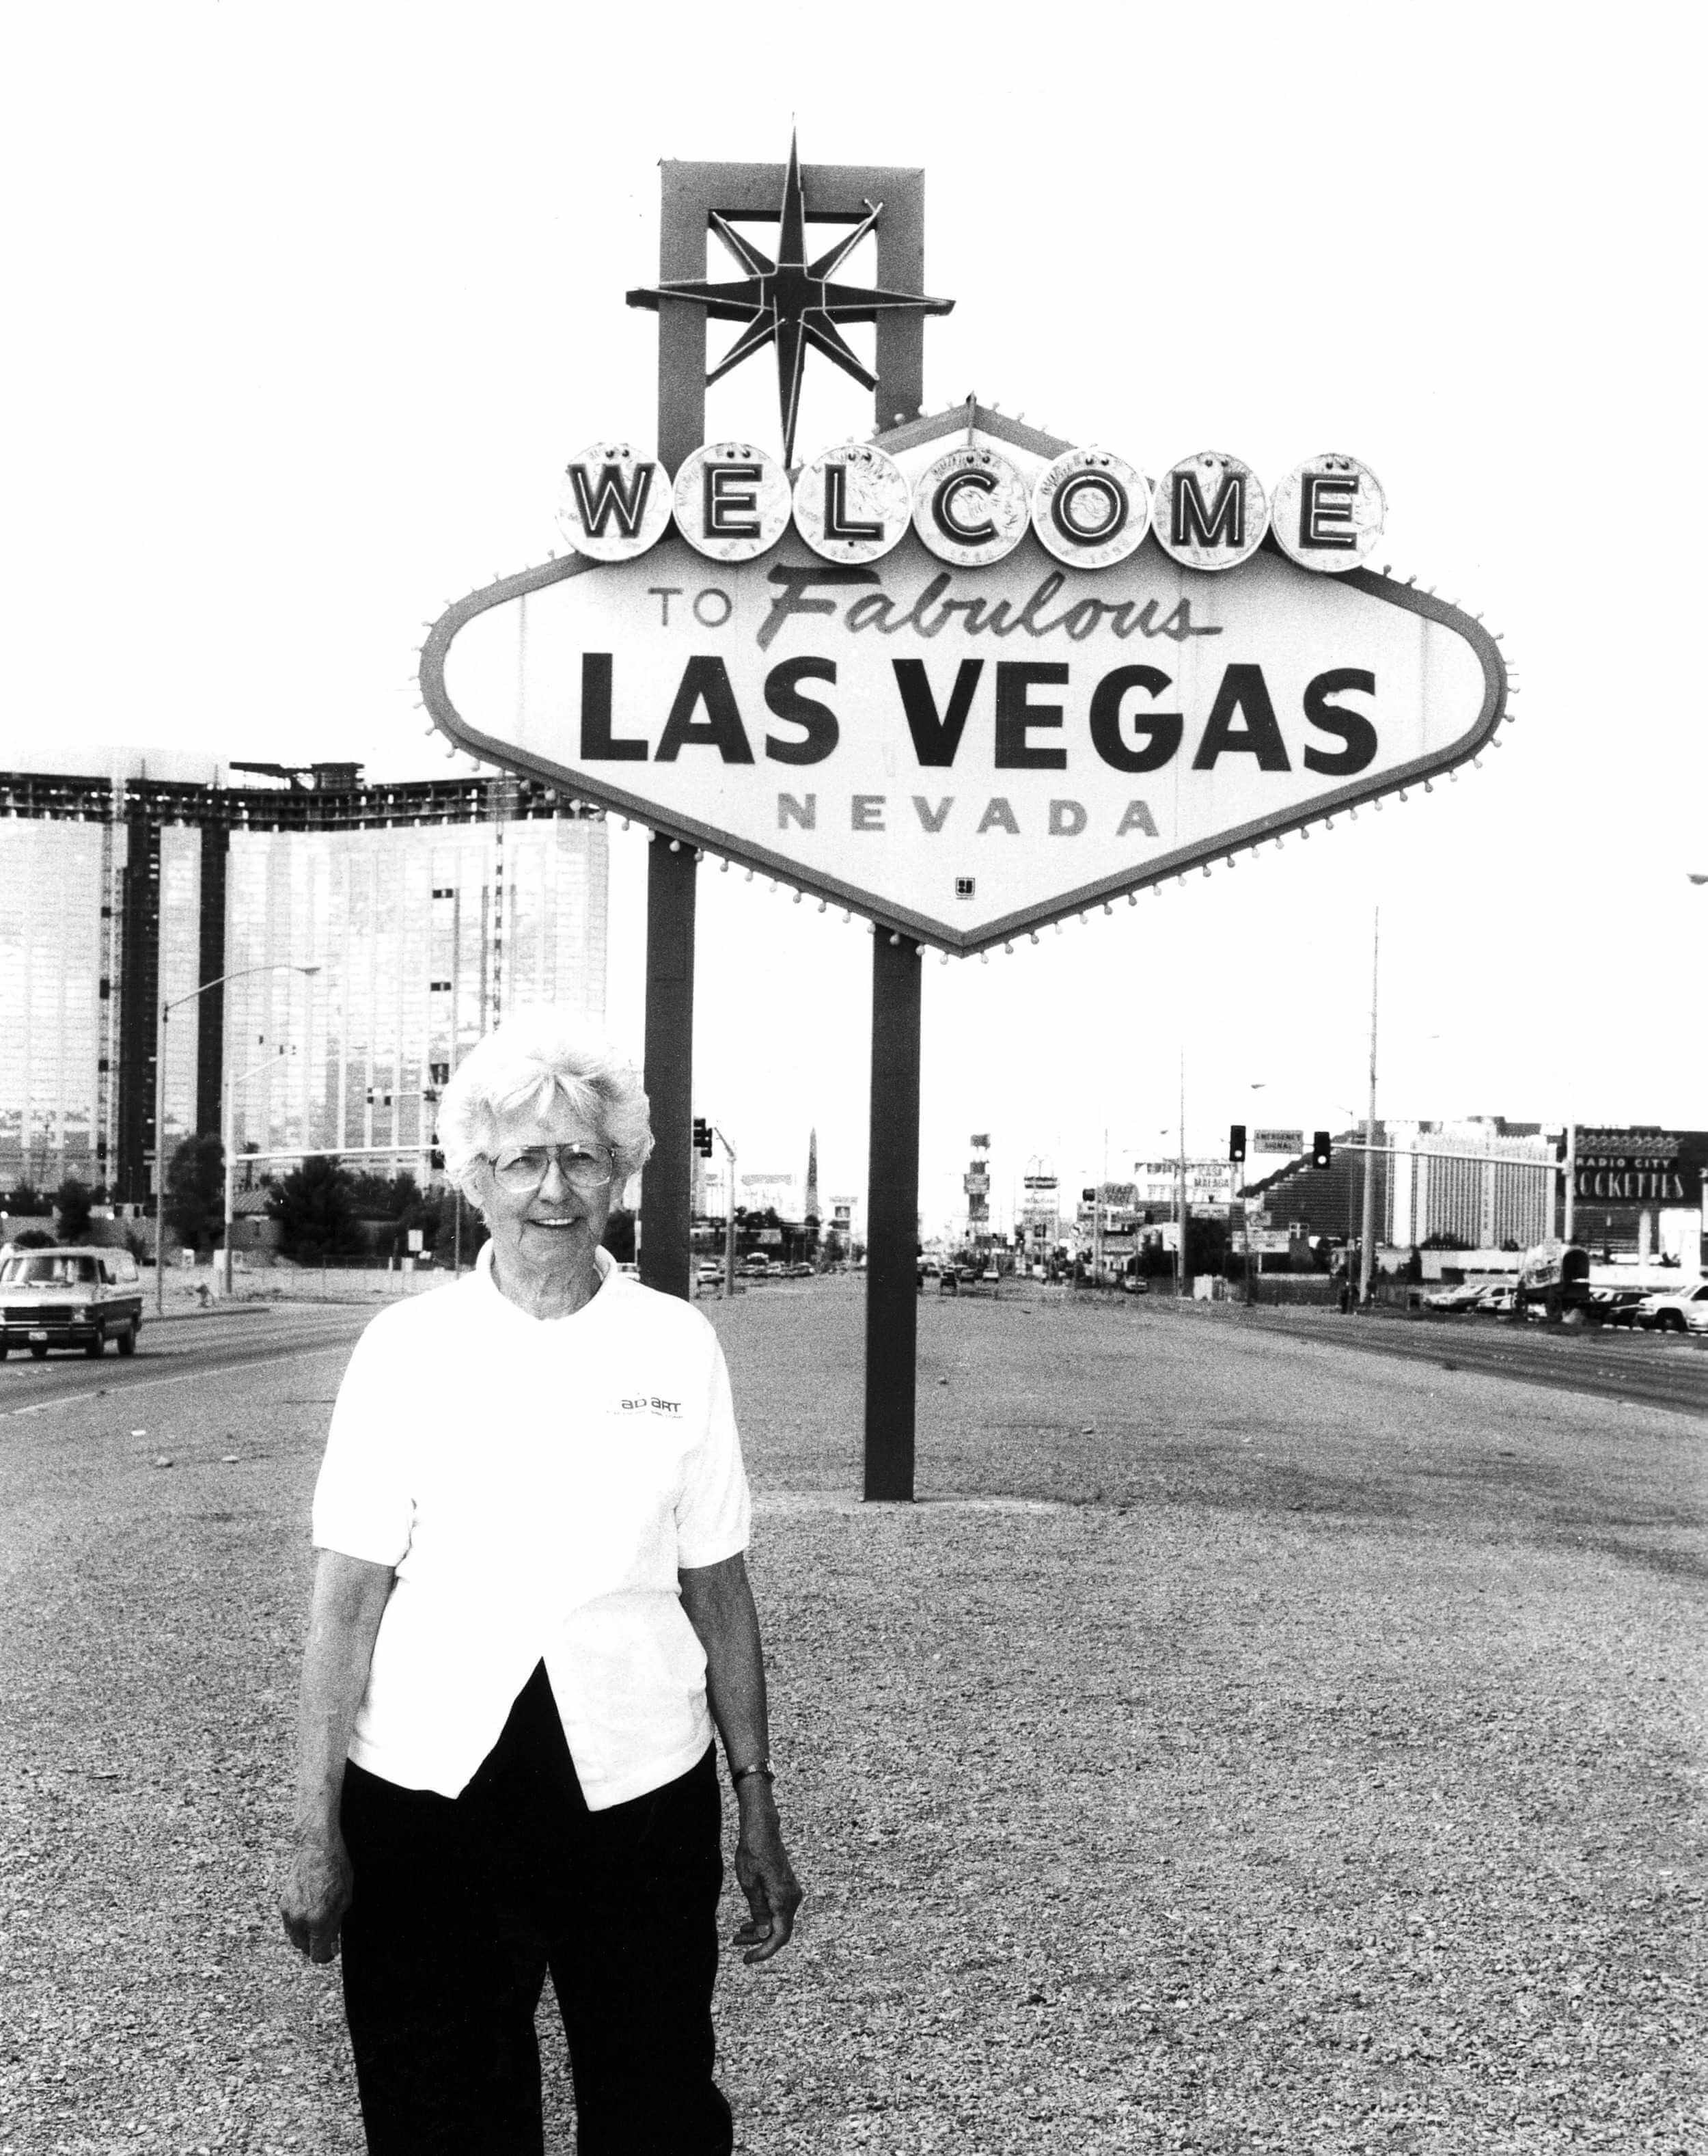 Betty willis creadora del cartel de Welcome to fabulous las vegas